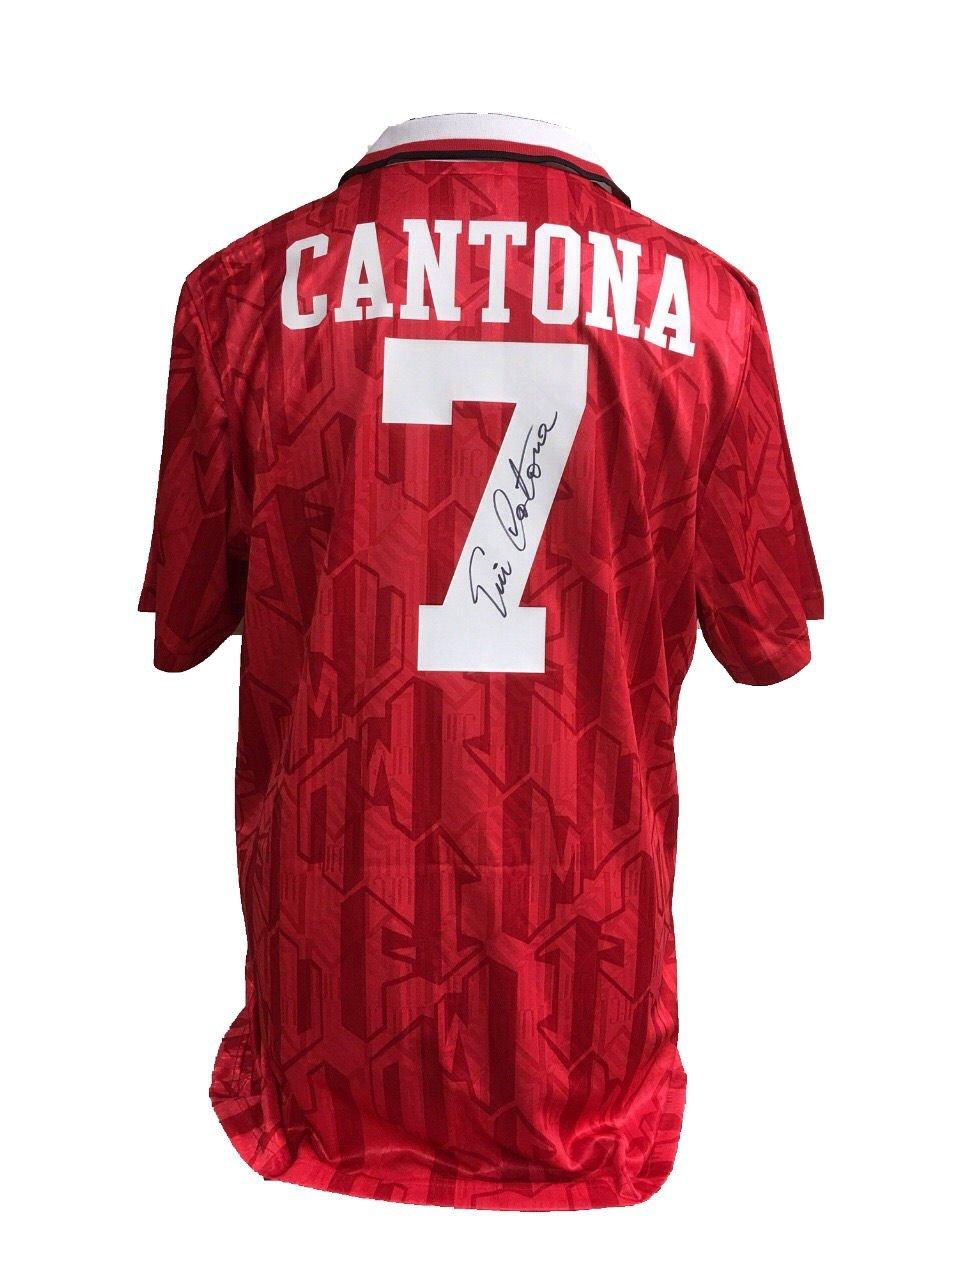 brand new ecdd2 686e2 Eric Cantona signed Manchester United official retro 1994 ...